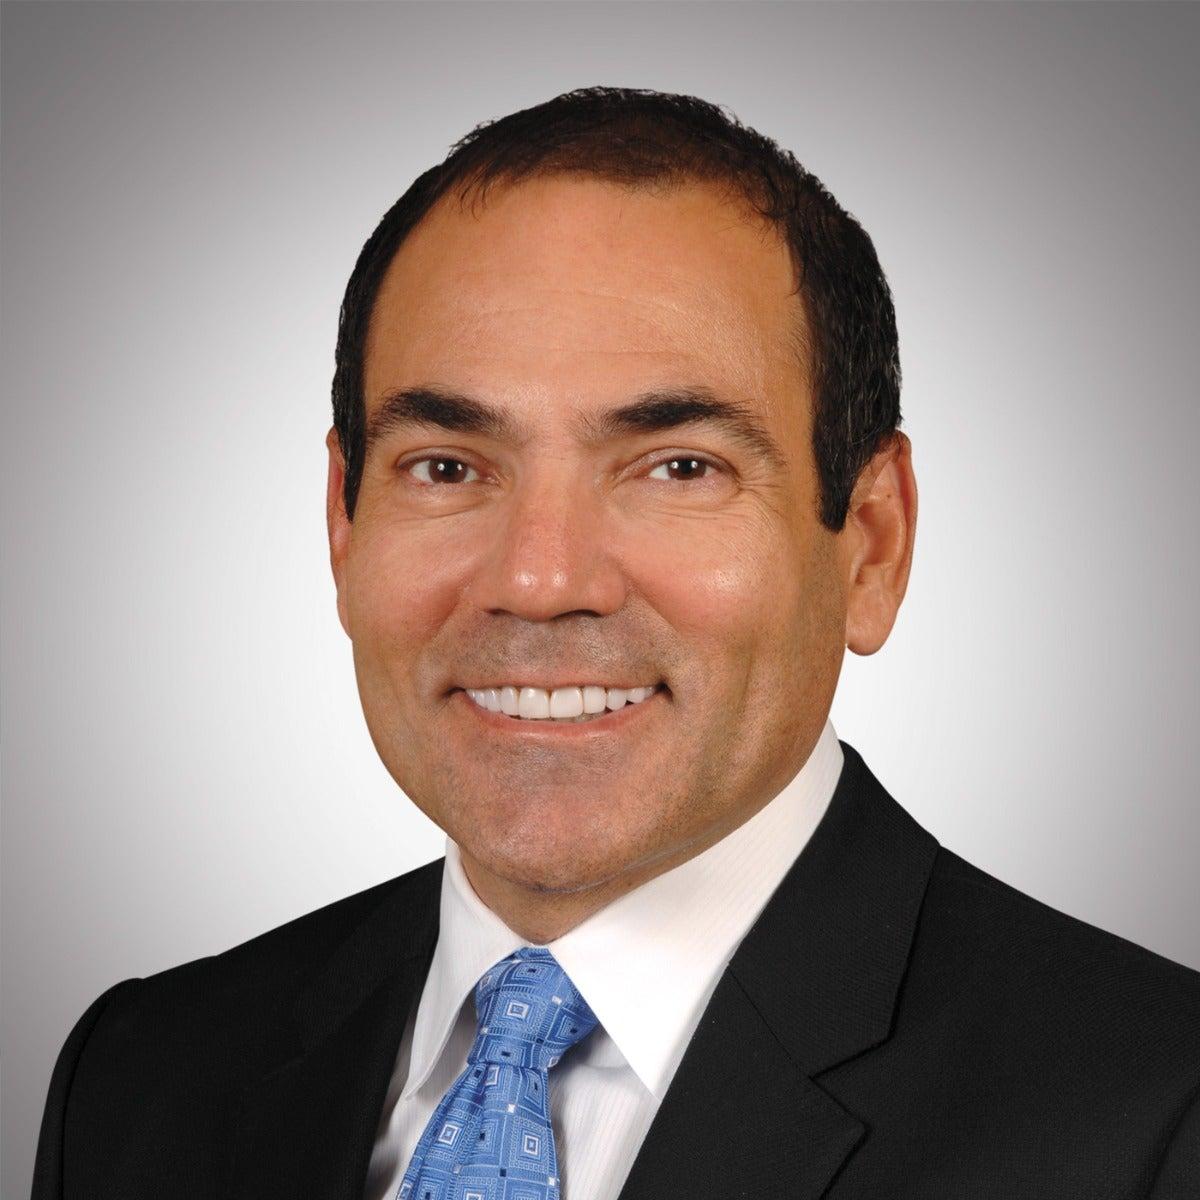 Louis Kaufman, DDS, FAGD, MBA